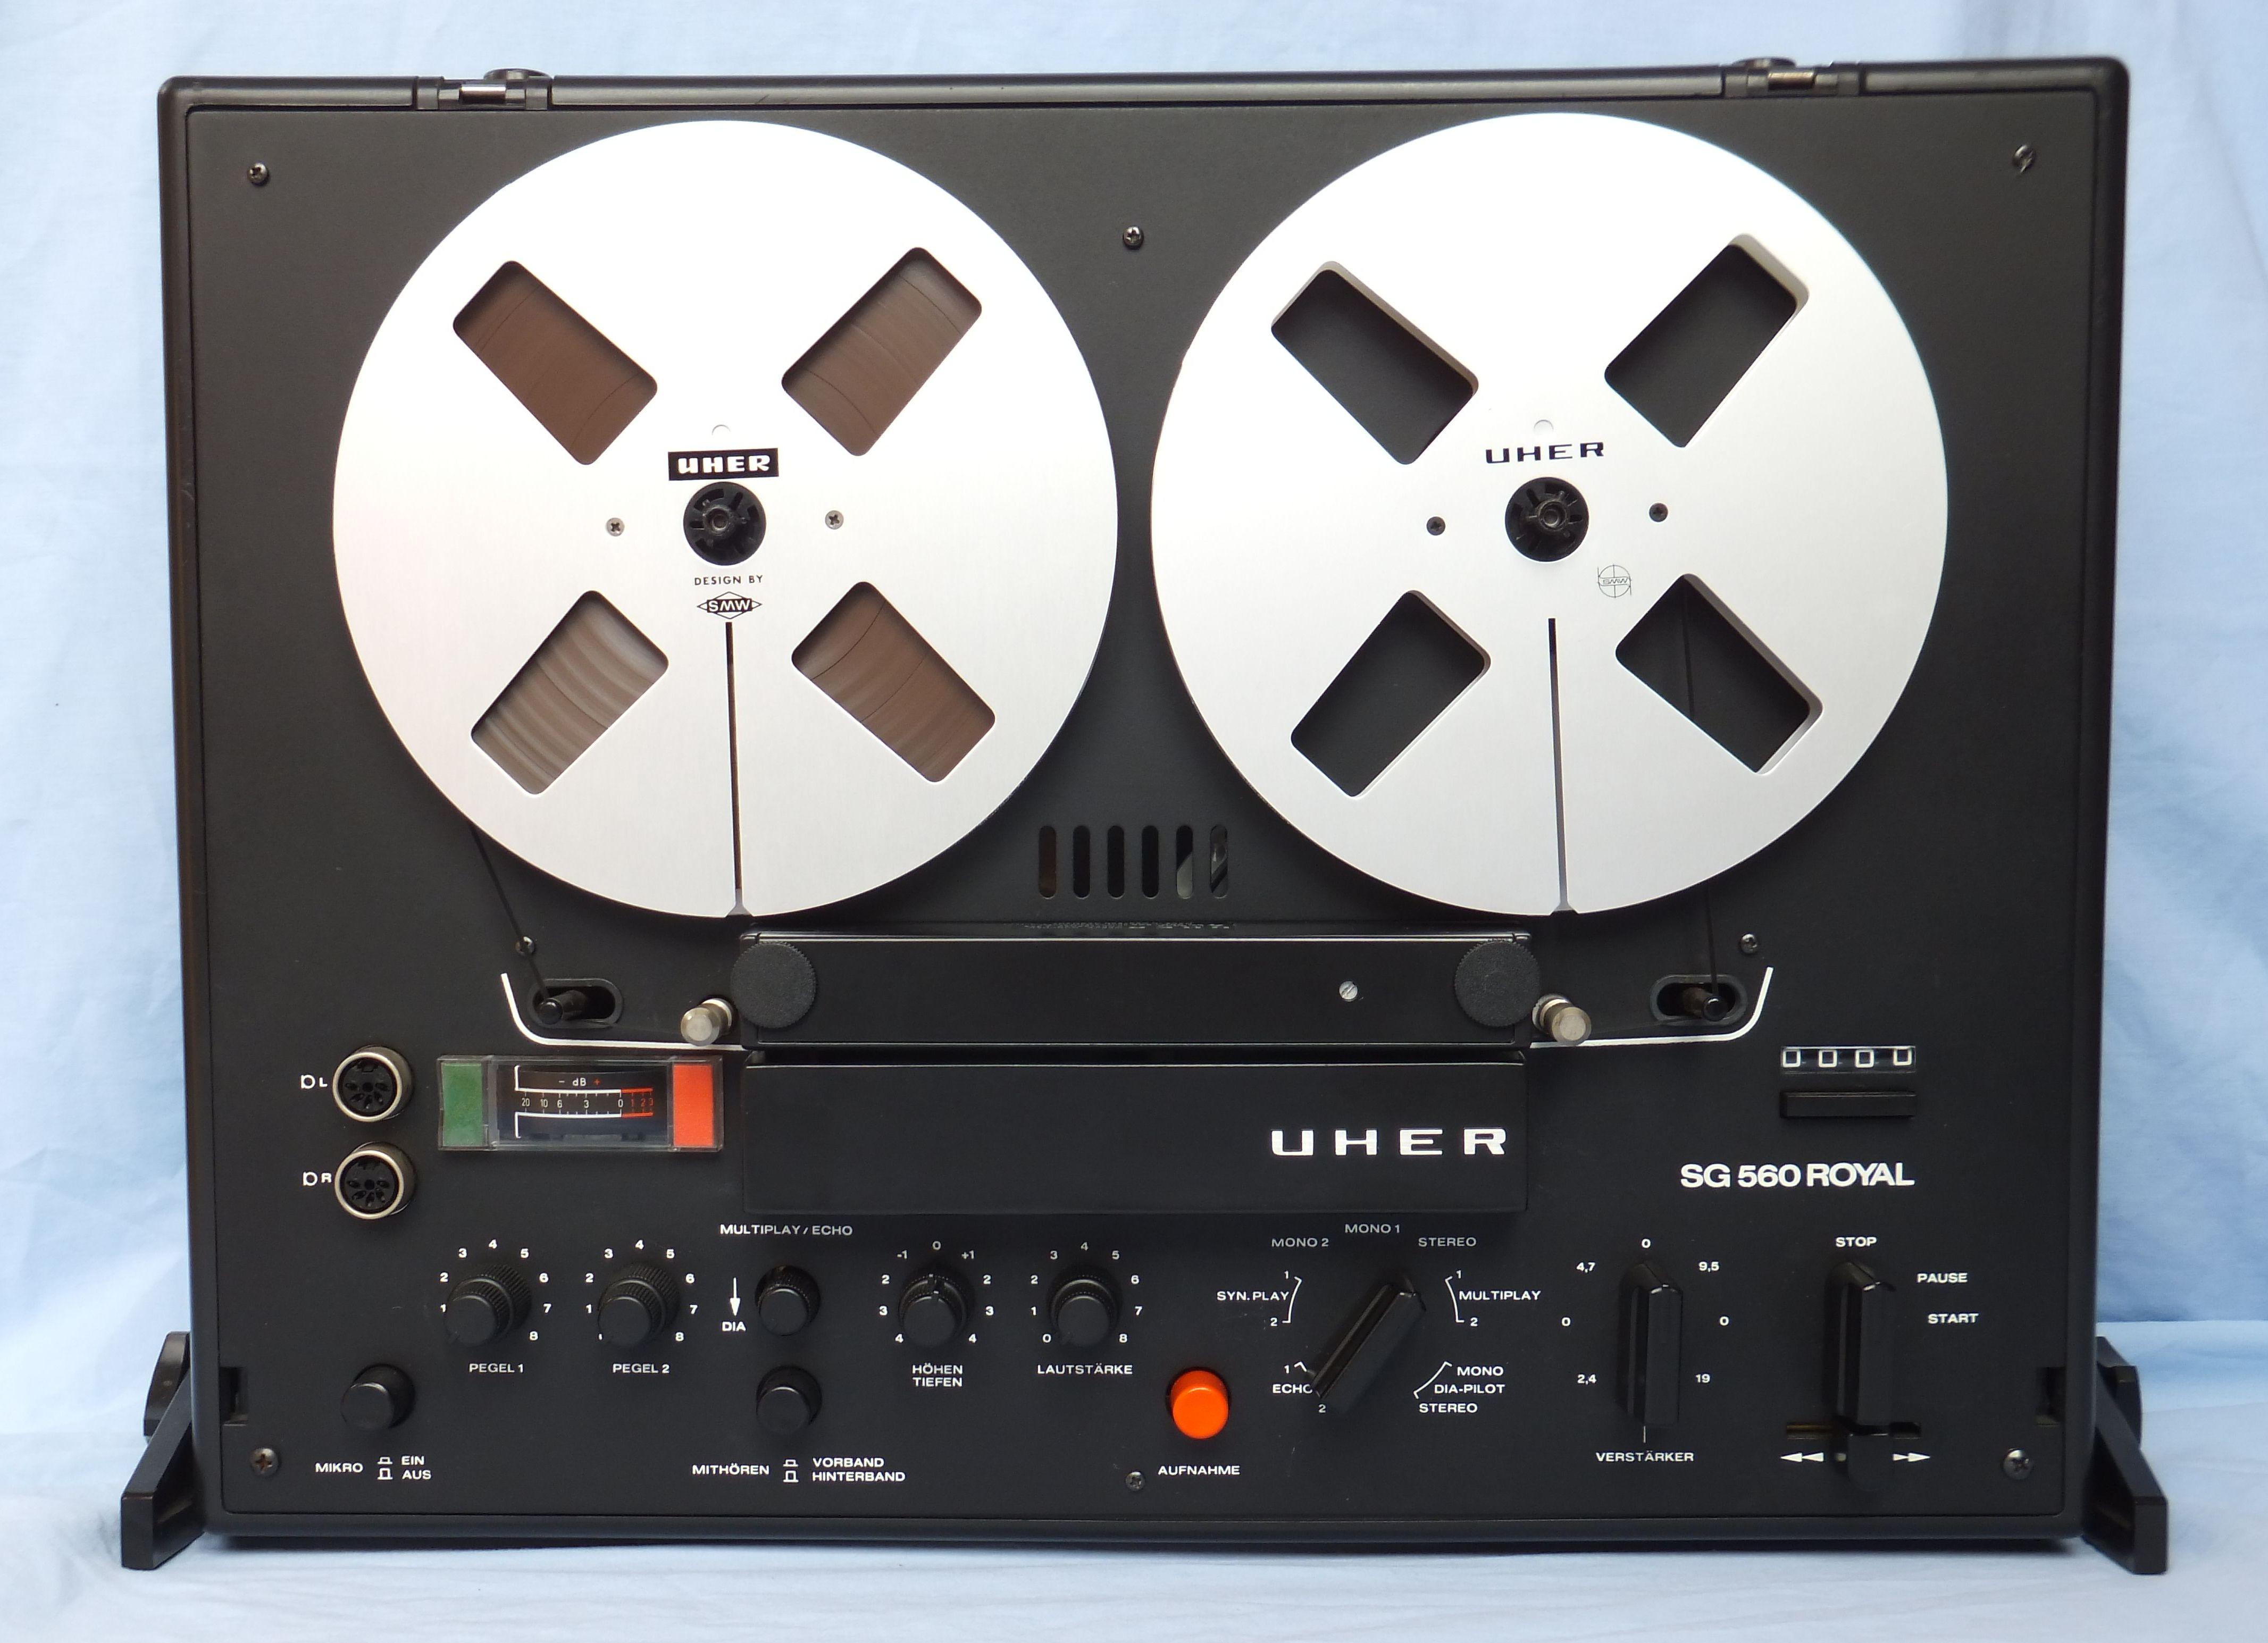 Technics HD310 UHER_SG560_Royal